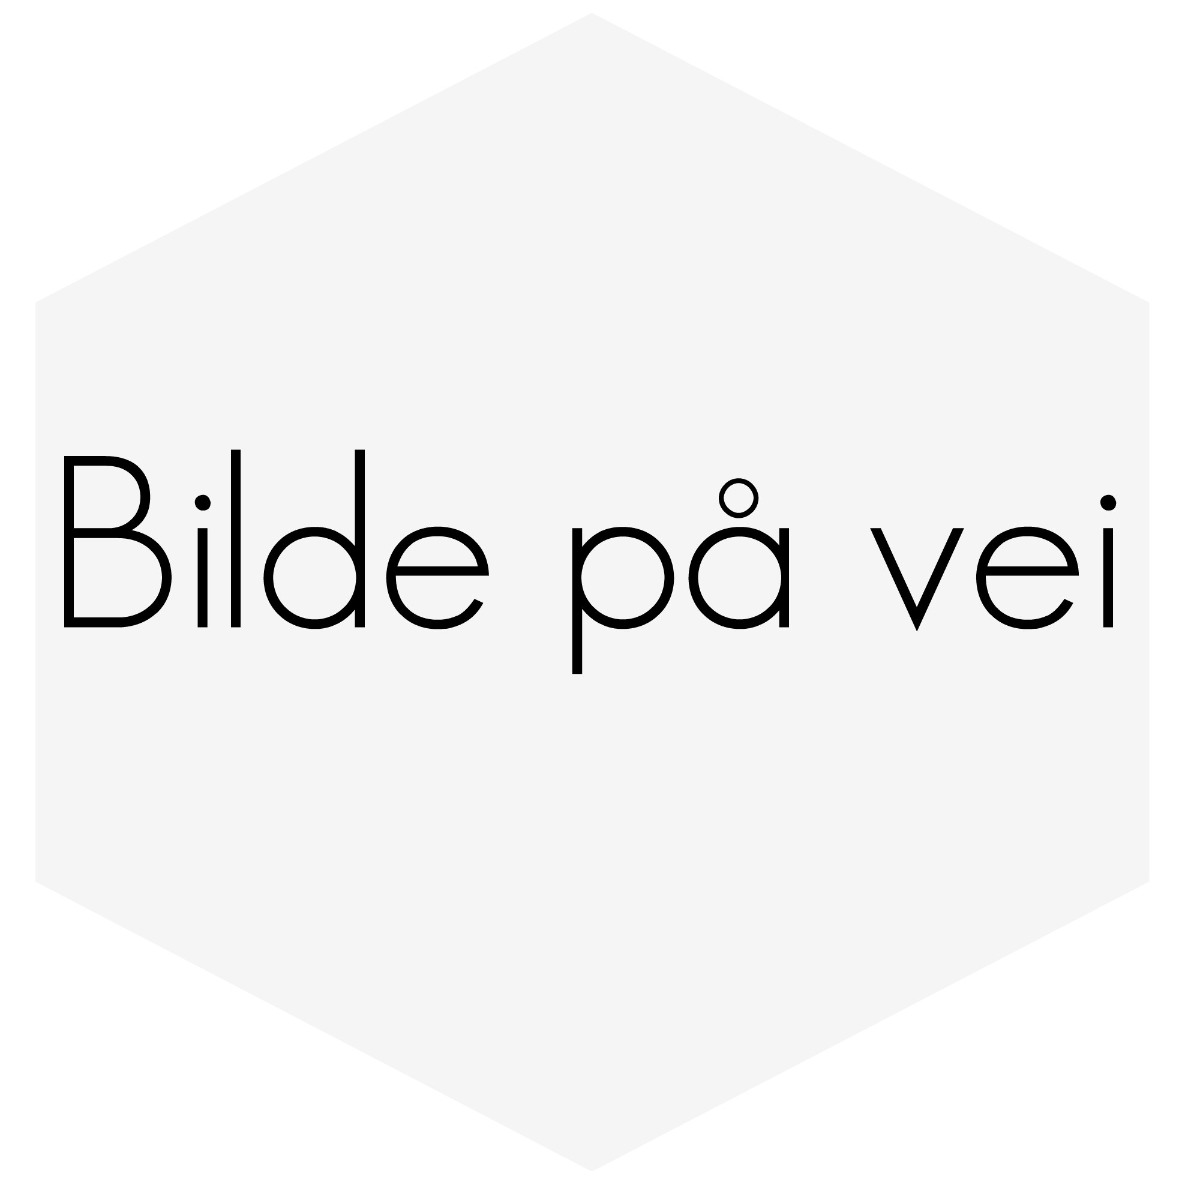 "SILIKONSLANGE RØD REDUSERING 1,75-2"" (45-51MM)"